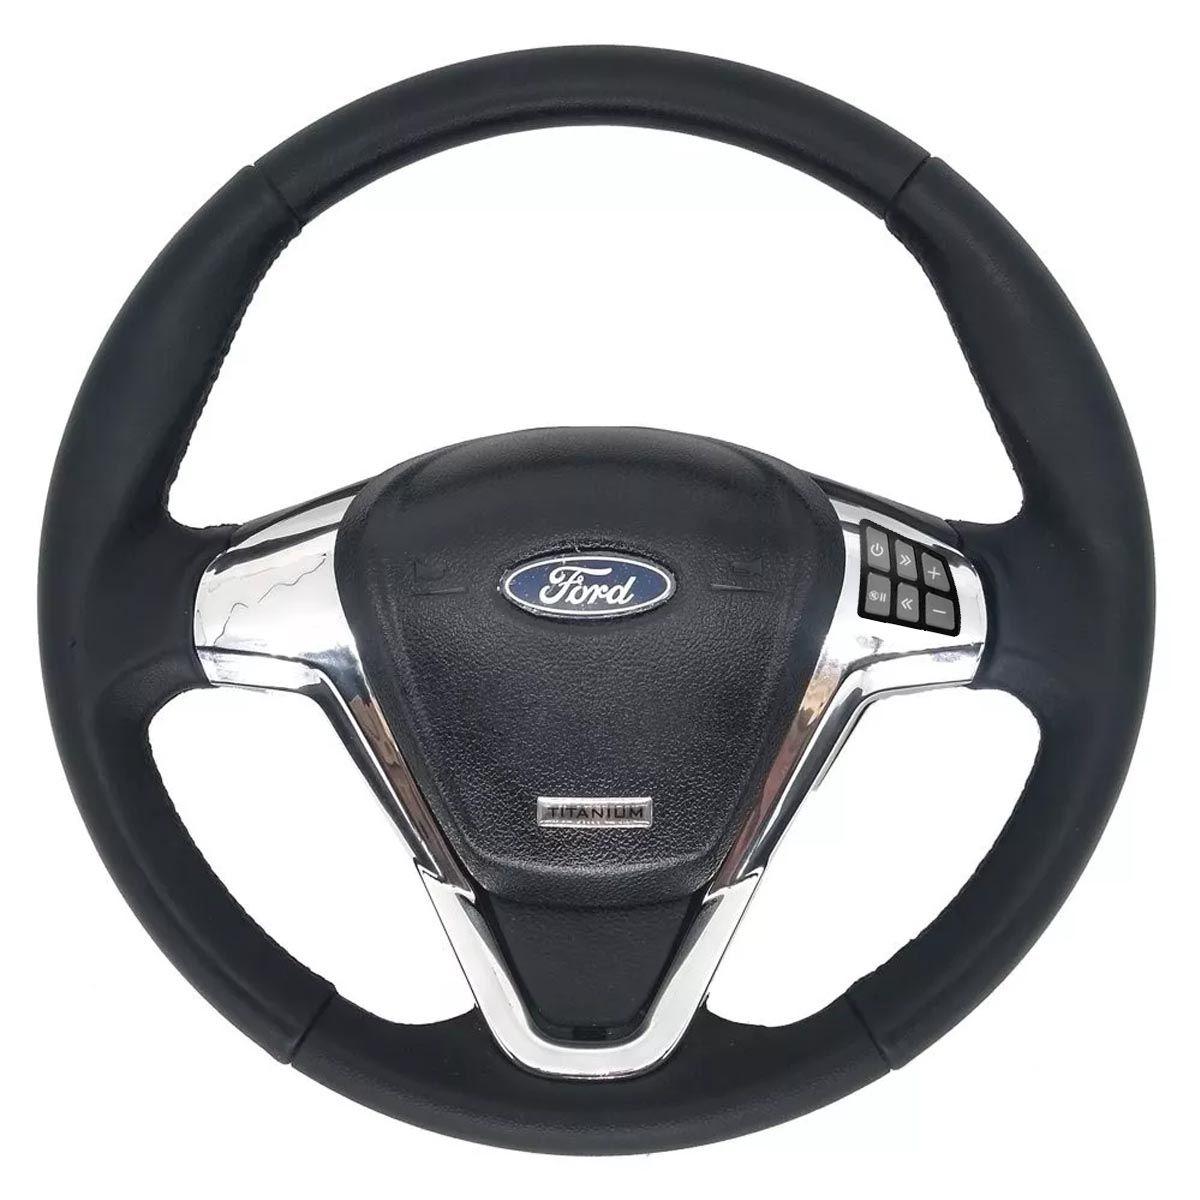 Volante Multifuncional Ford Titanium Esportivo Cubo Fiesta Ka Ecosport Escort Hobby Zetec F100 F1000 Poliparts